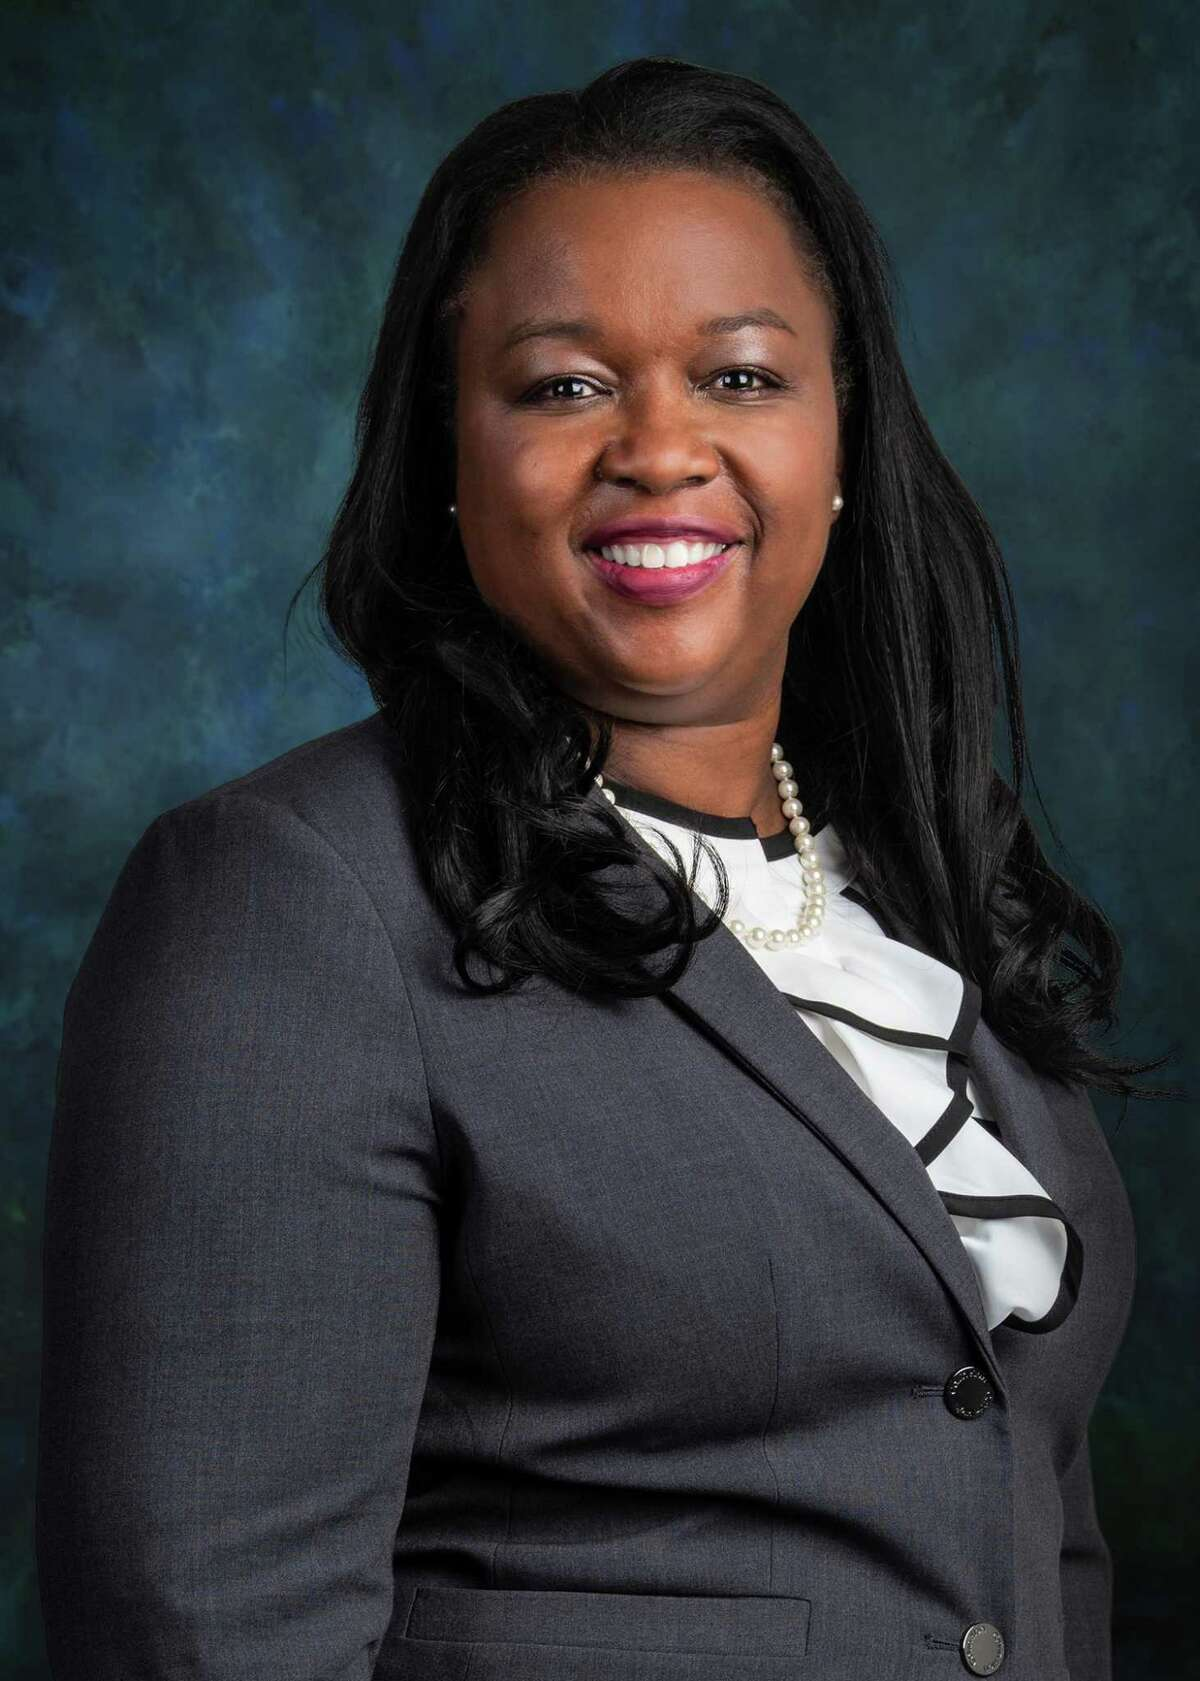 Cy-Fair ISD named Felicia Thomas as the new principal at Tipps Elementary on Jan. 20, 2021.